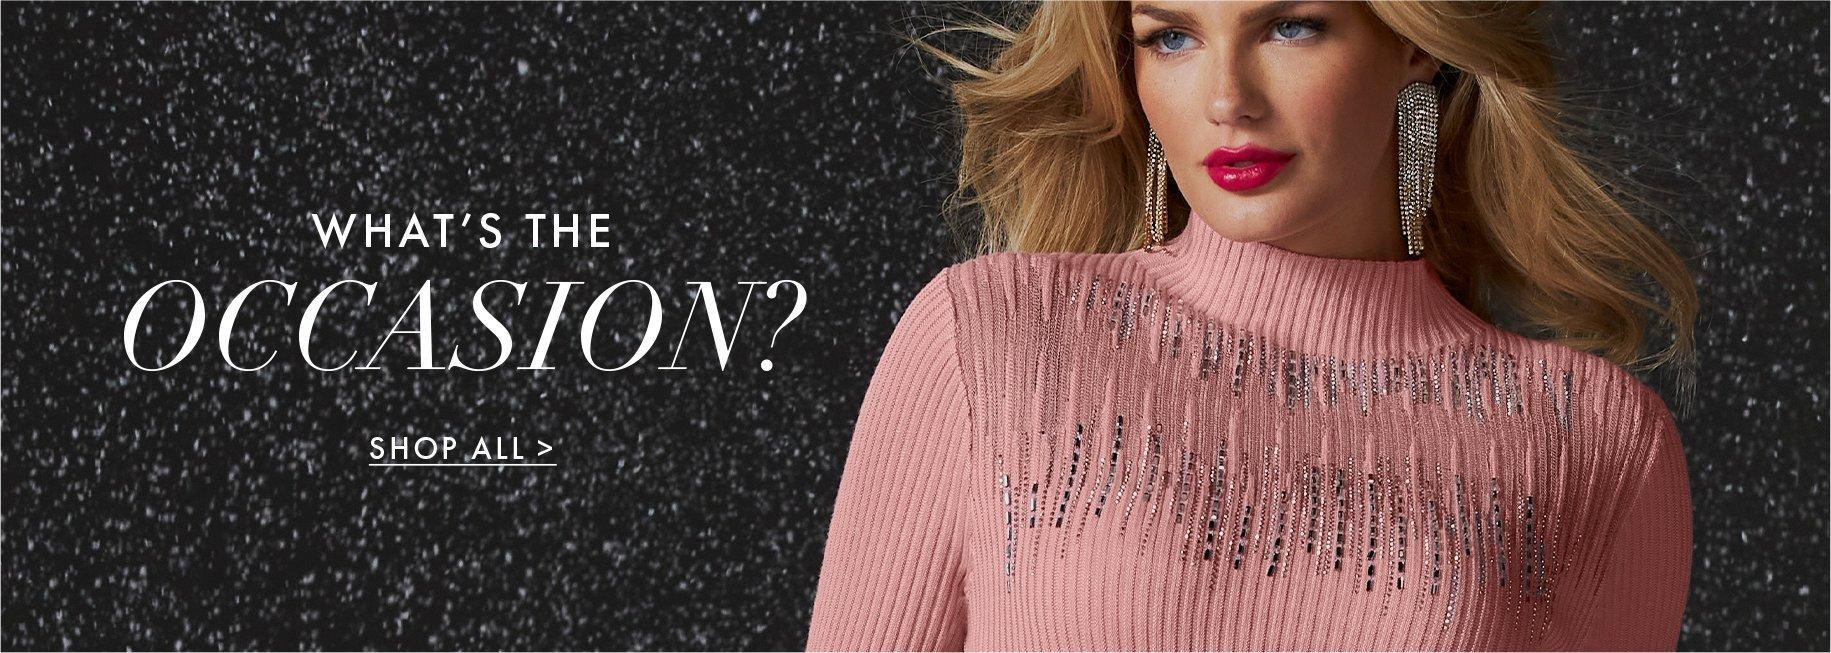 model wearing a light pink rhinestone embellished turtleneck sweater.